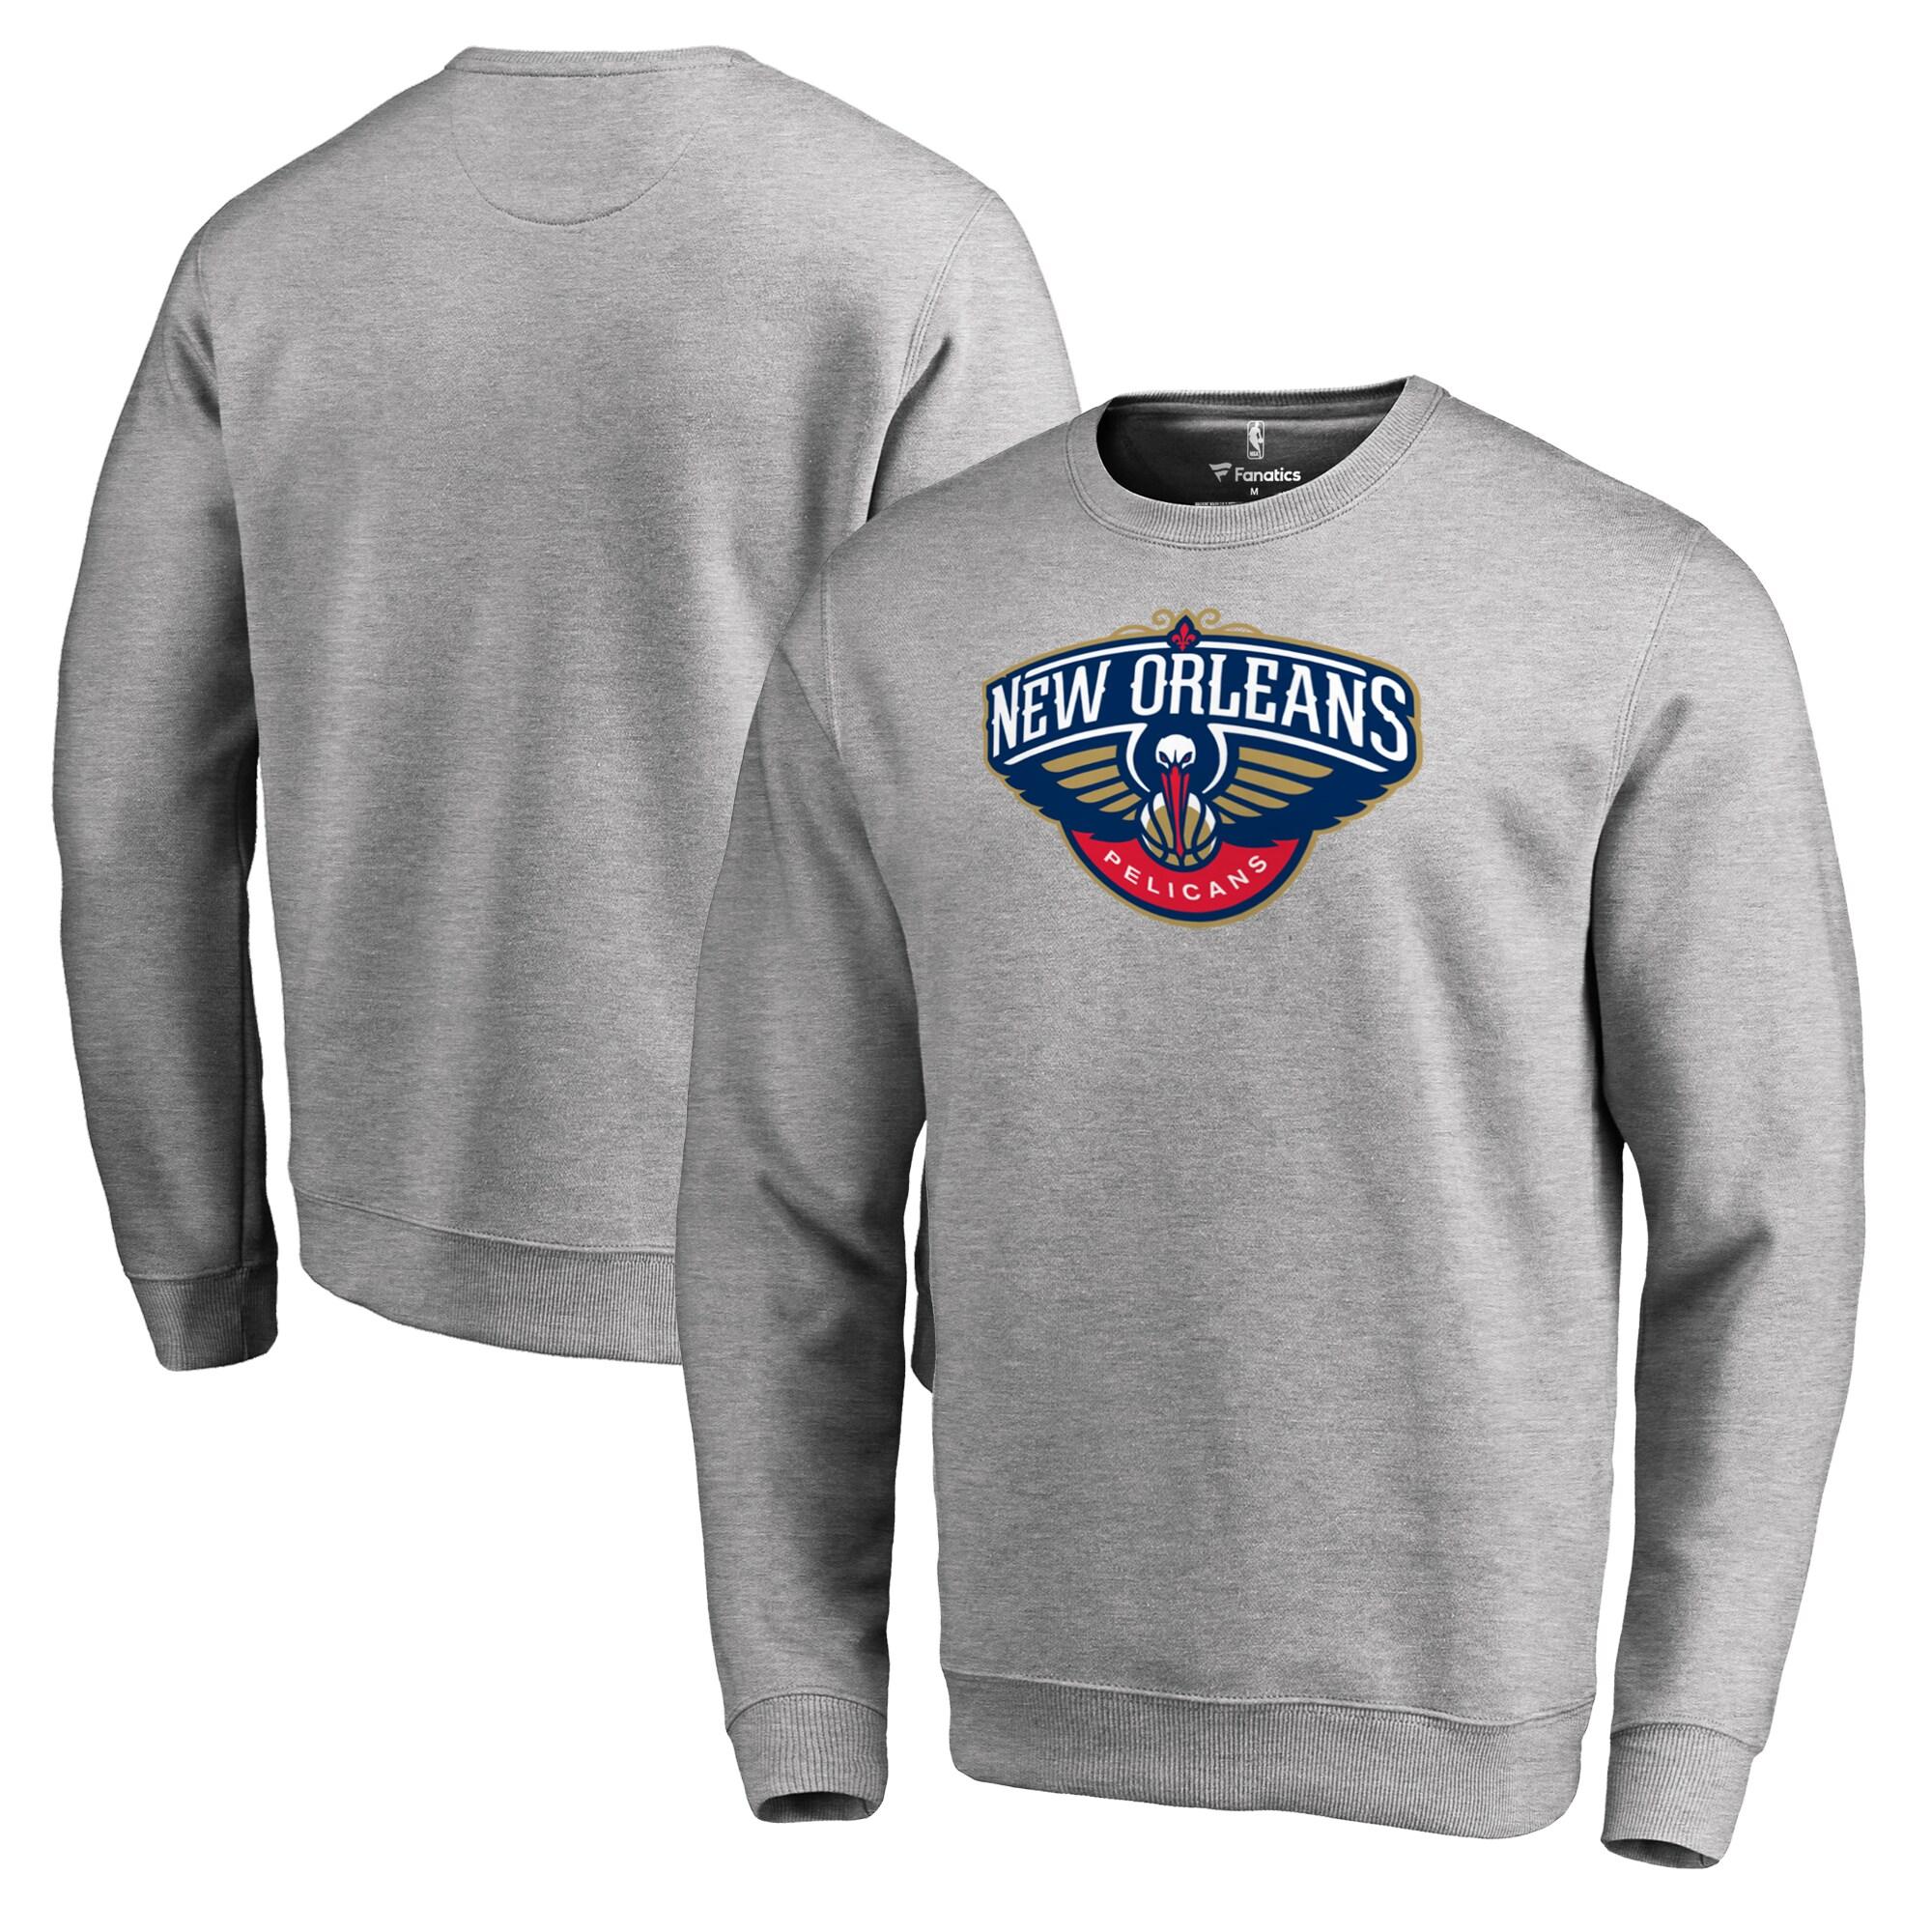 New Orleans Pelicans Fanatics Branded Primary Logo Sweatshirt - Heathered Gray